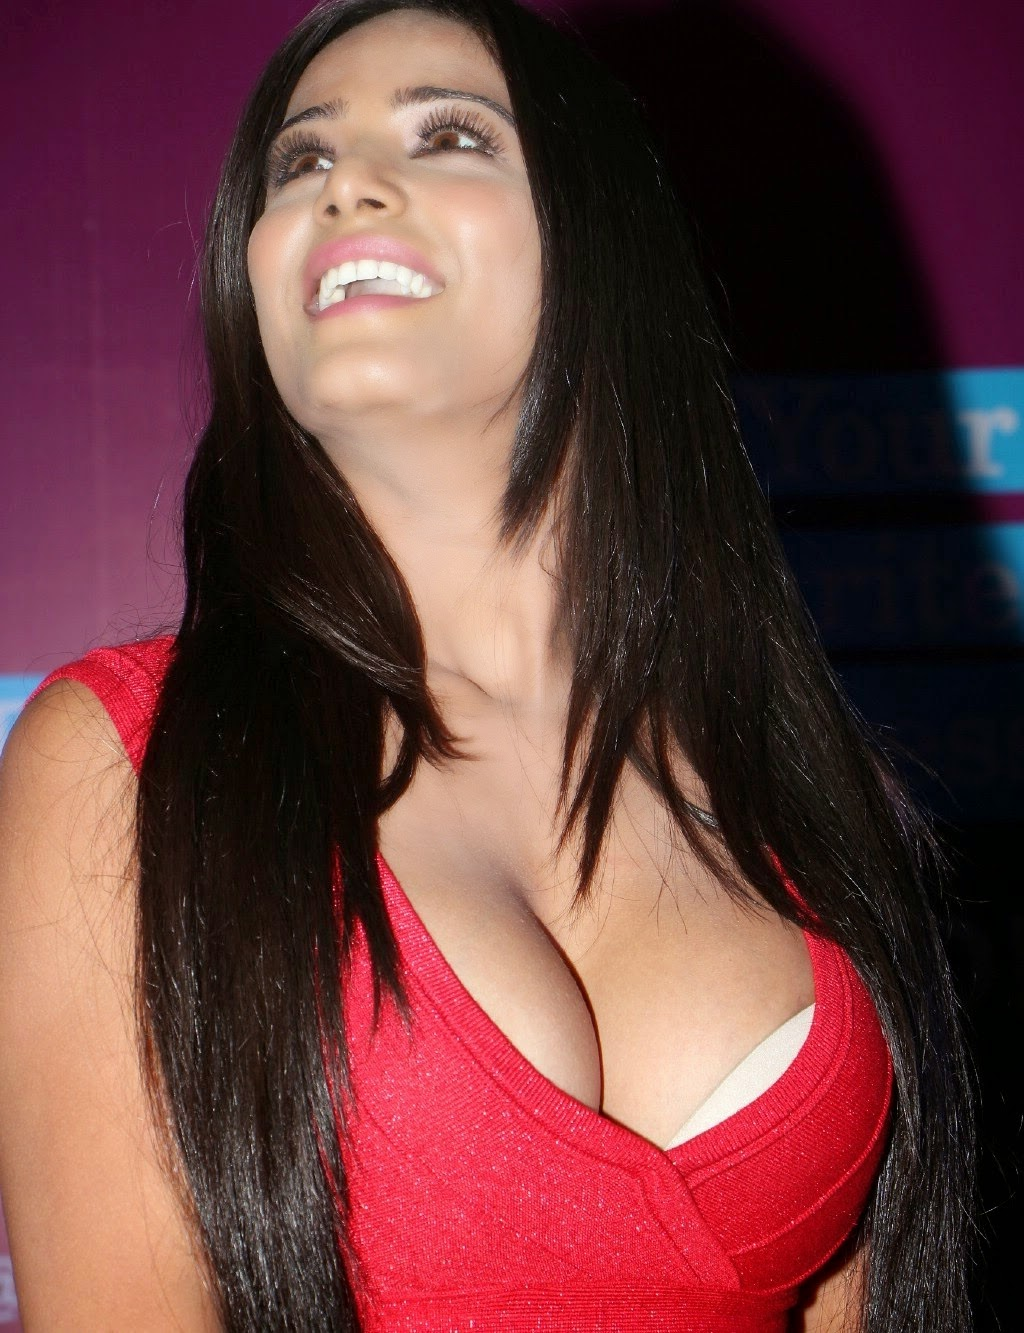 Aashi Thakur Topless. Leaked